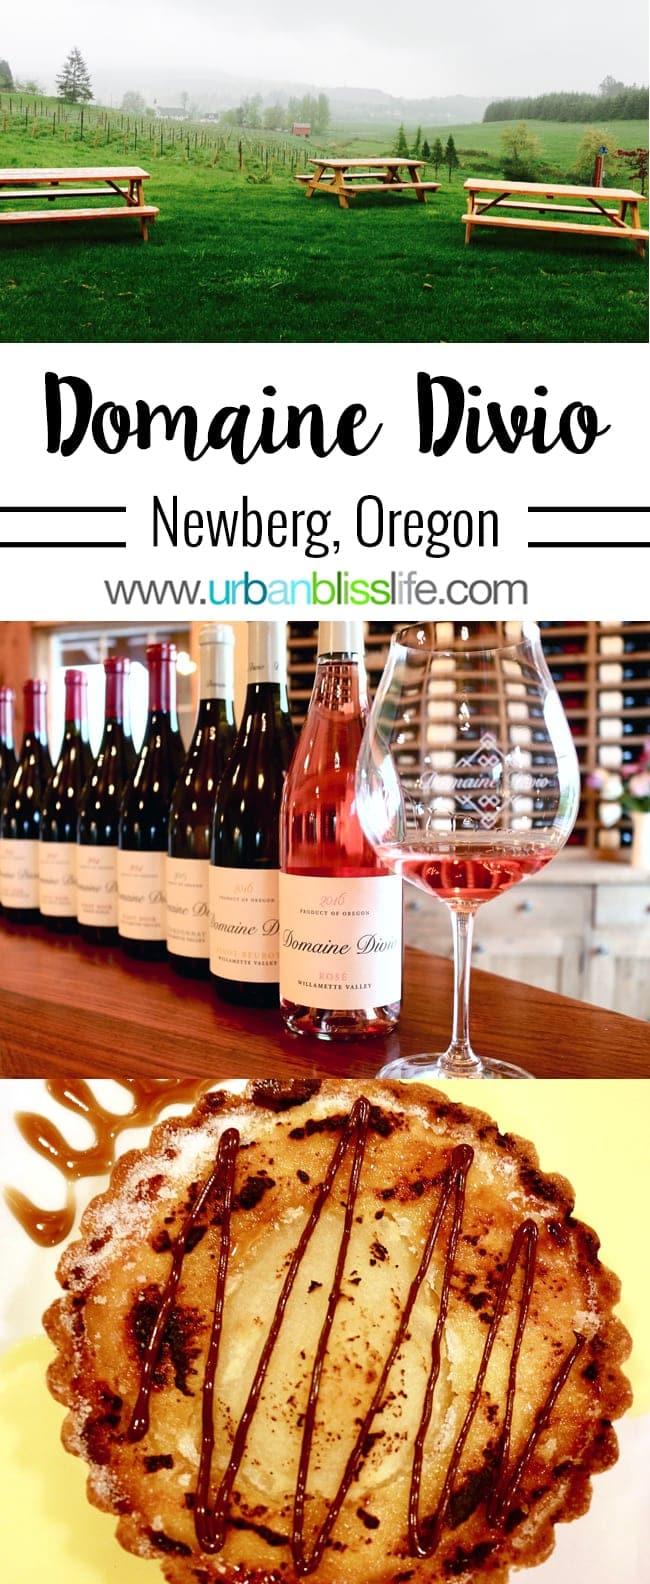 Domaine Divio Oregon winery in Oregon's Willamete Valley wine country on UrbanBlissLife.com